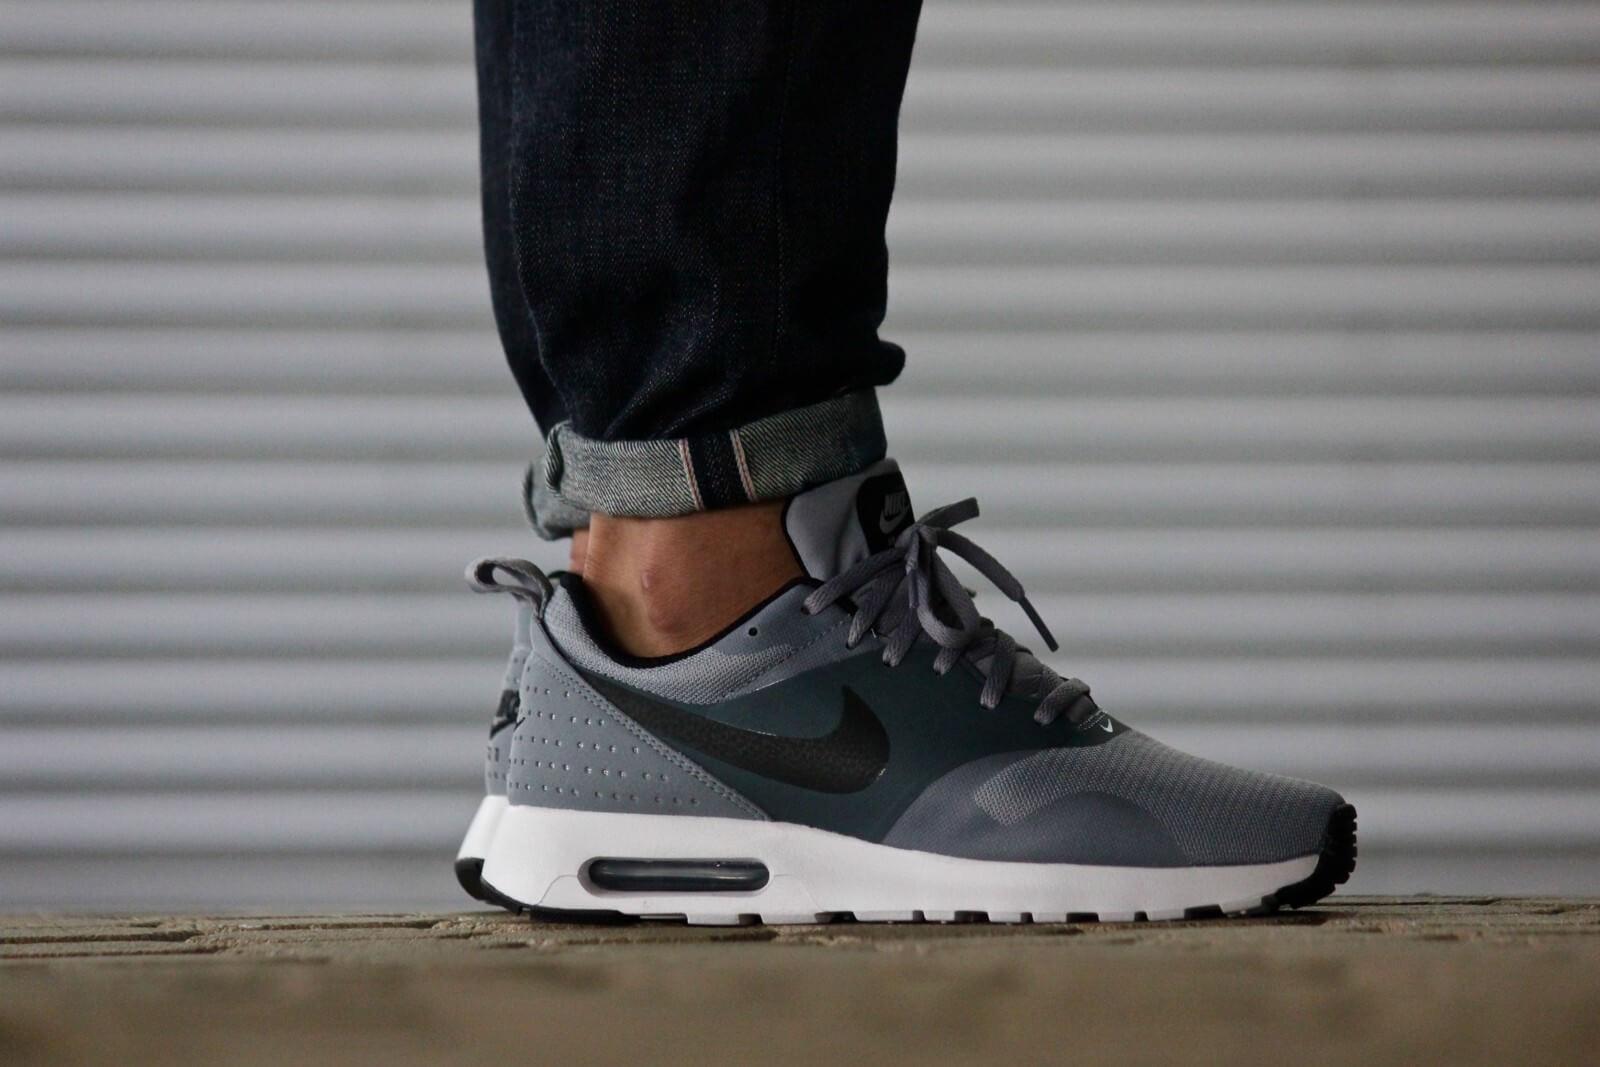 Nike Air Max Tavas StealthBlack Sneaker District